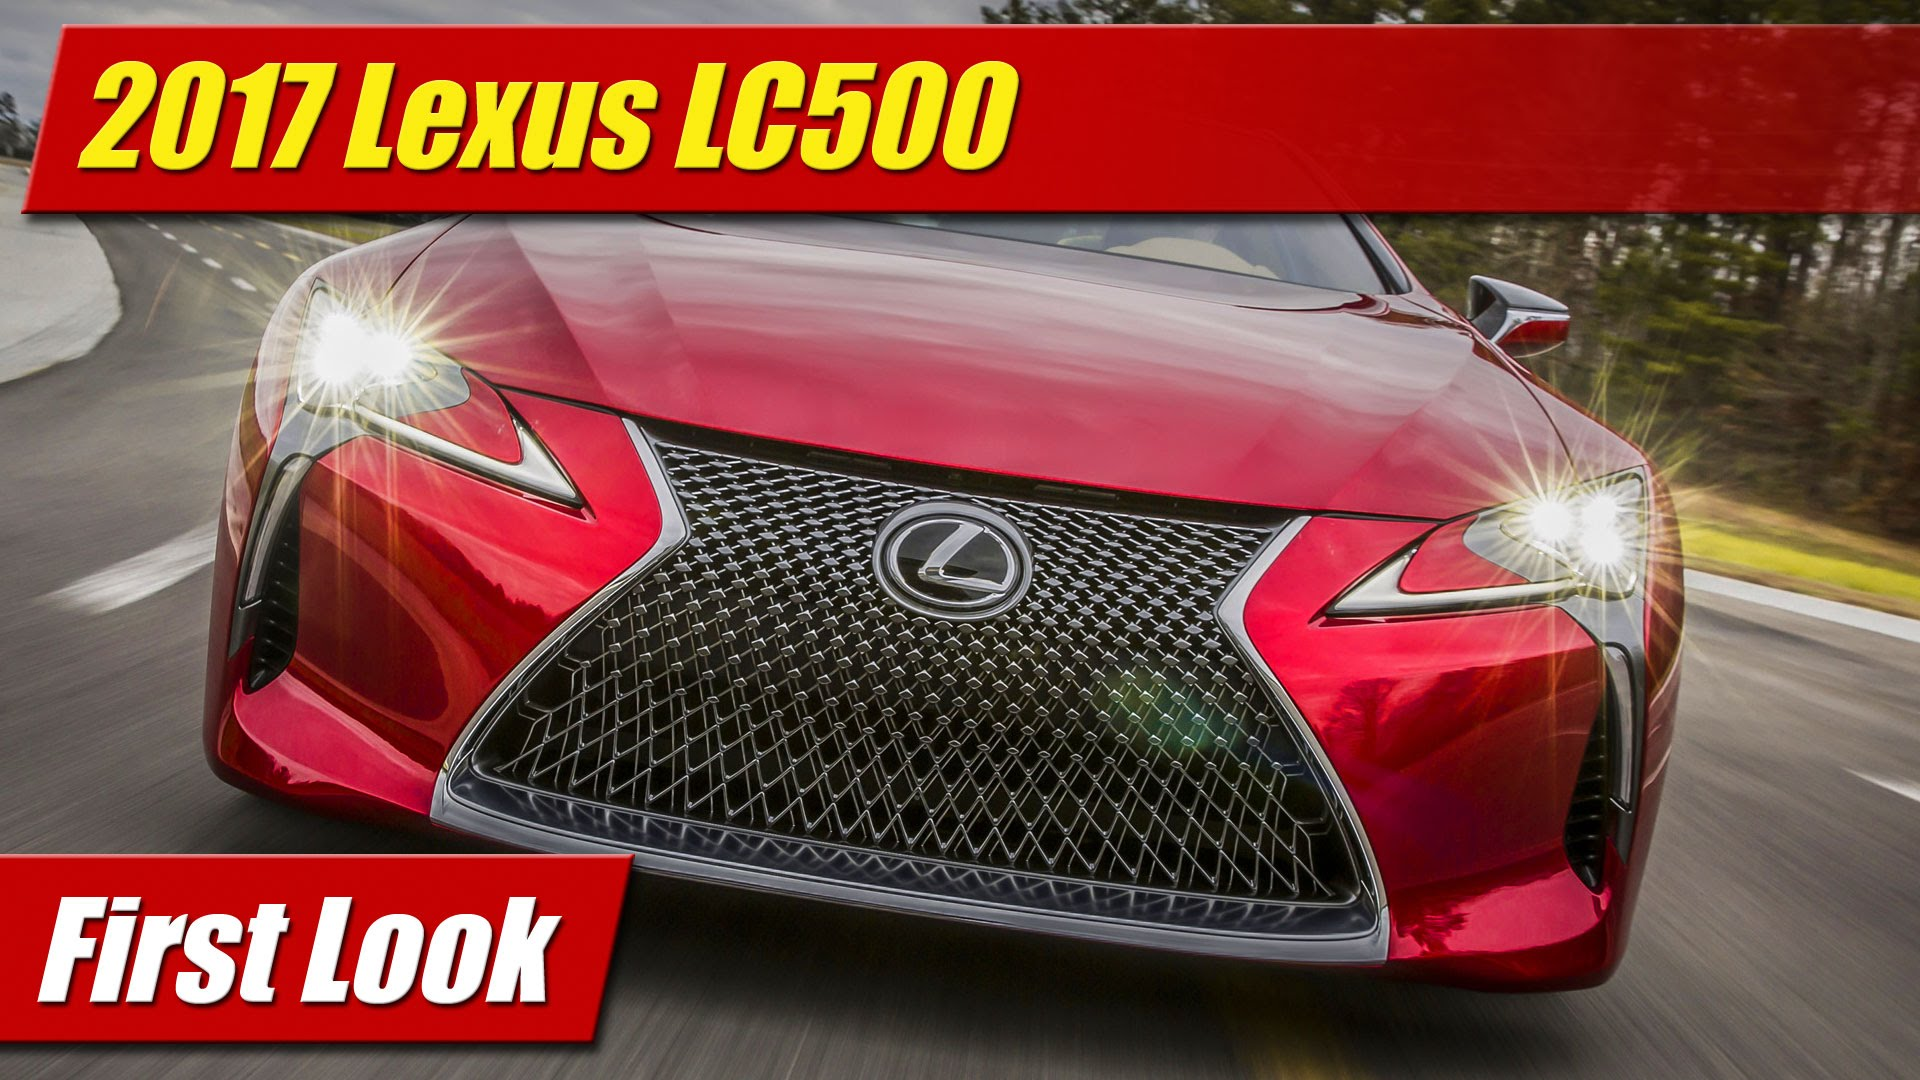 First Look: 2017 Lexus LC500 - TestDriven.TV